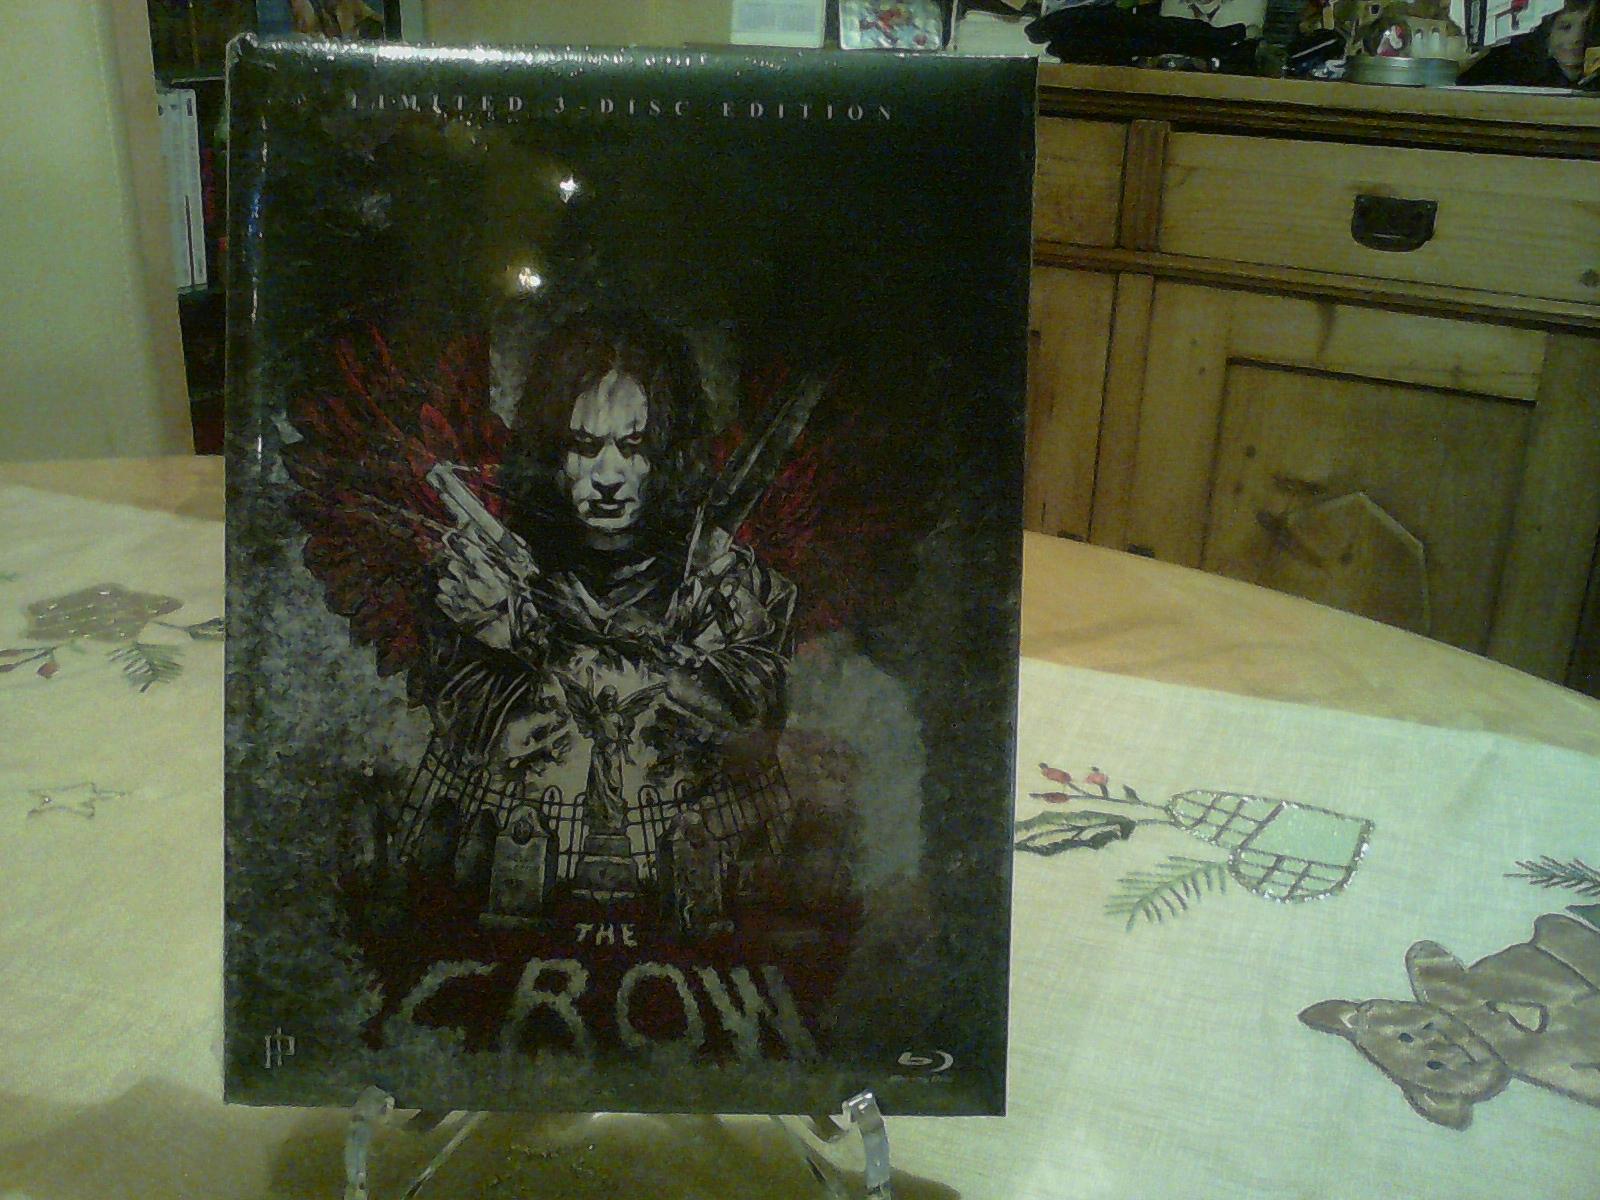 The Crow Mediabook